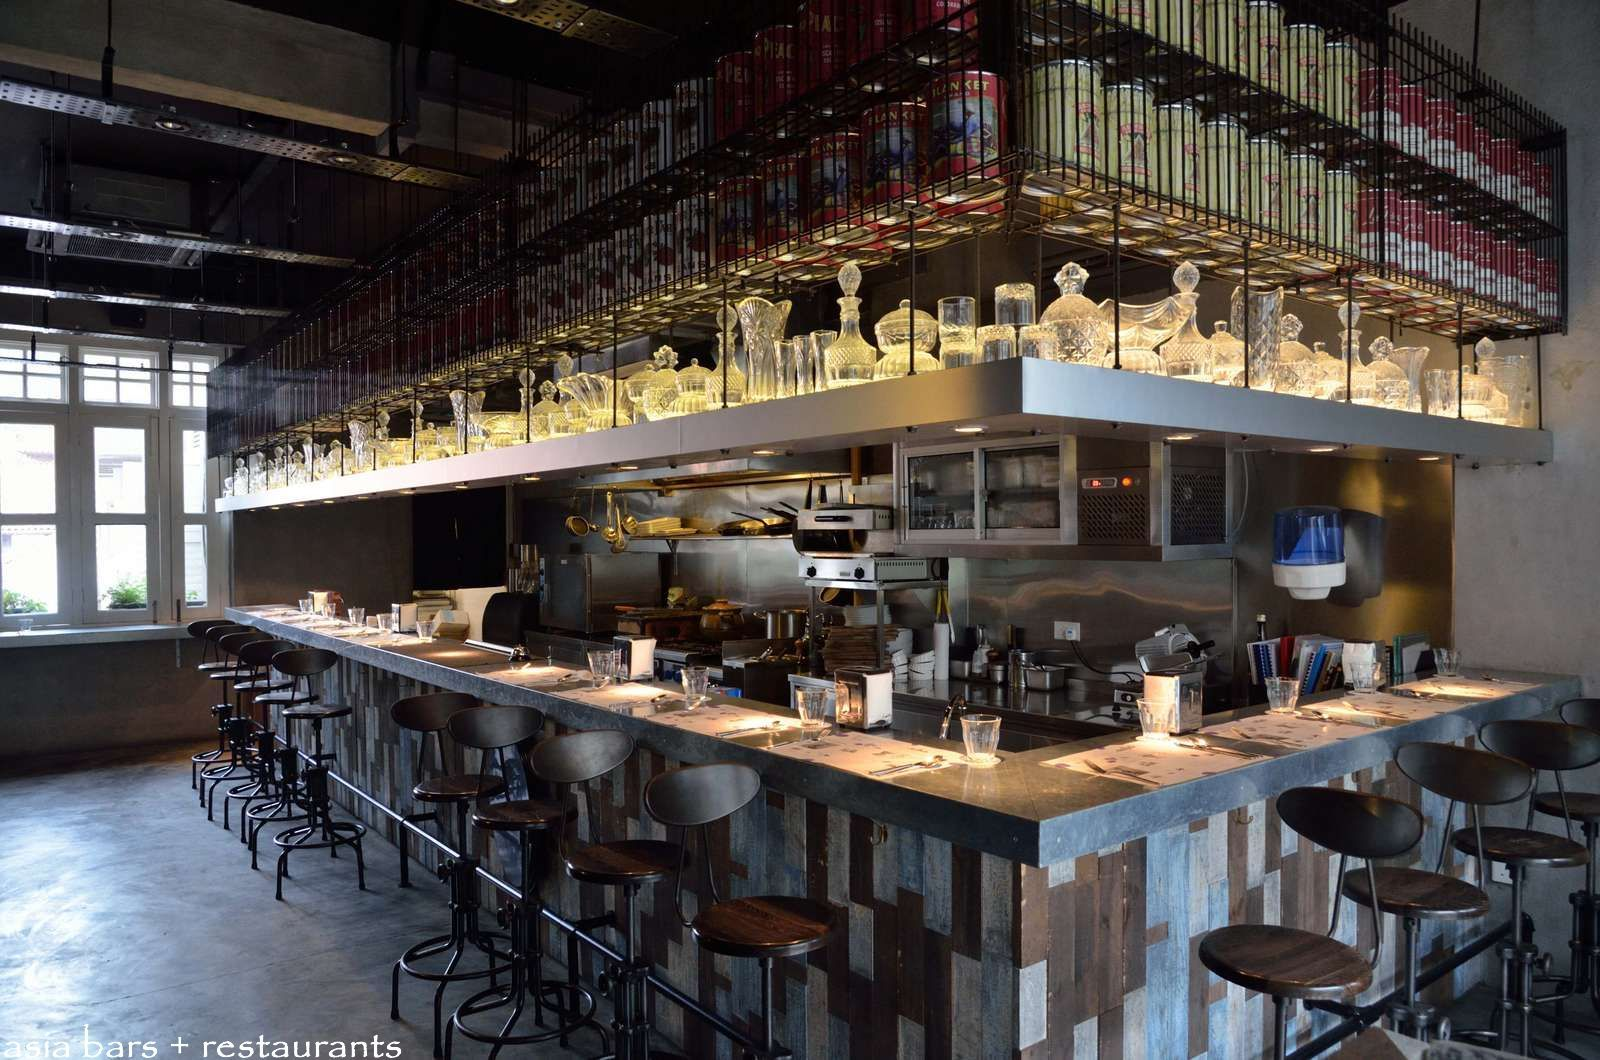 Restaurant Kitchen Design Kohler Purist Faucet Dining At The Lolla Open A Bar Menu